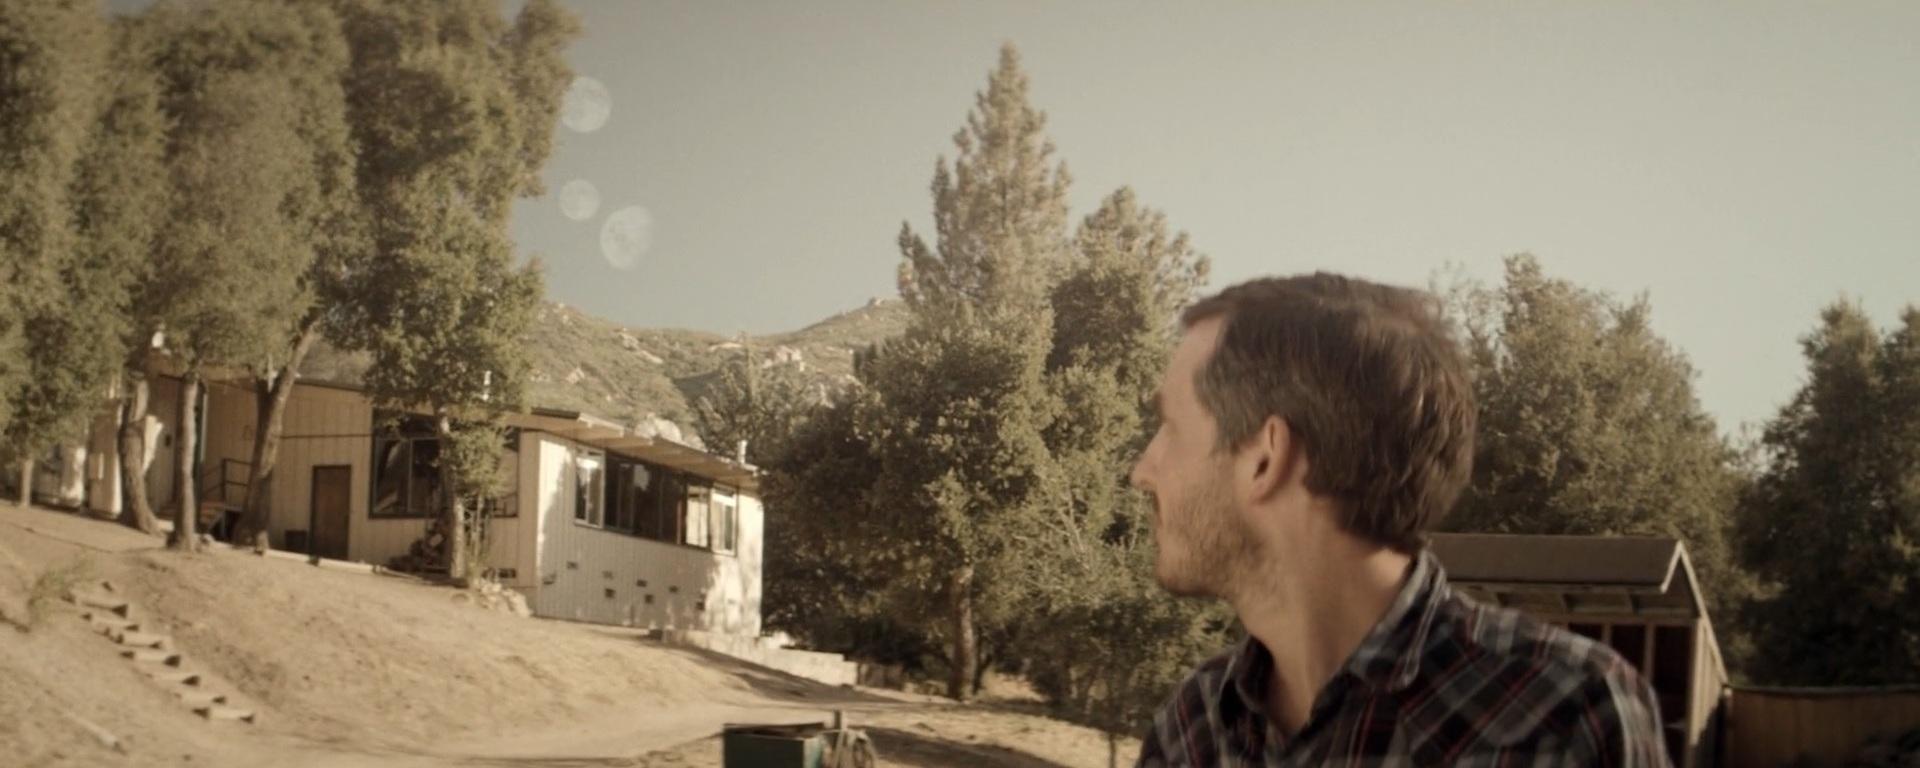 The Endless - CineFatti